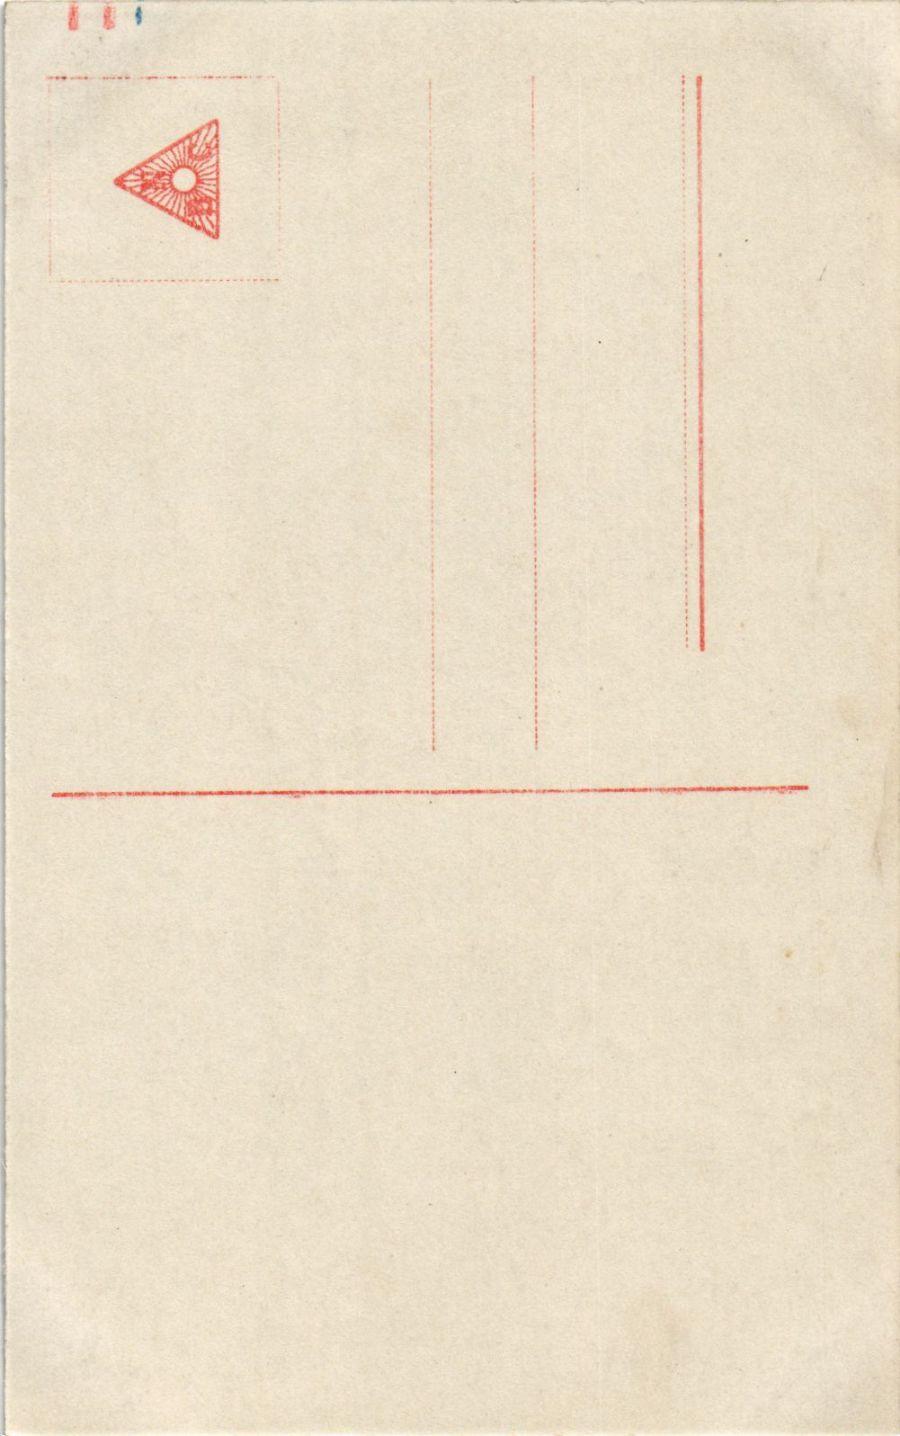 CPA-AK-Prinz-Karl-Franz-Joseph-v-Preussen-GERMAN-ROYALTY-867655 Indexbild 2